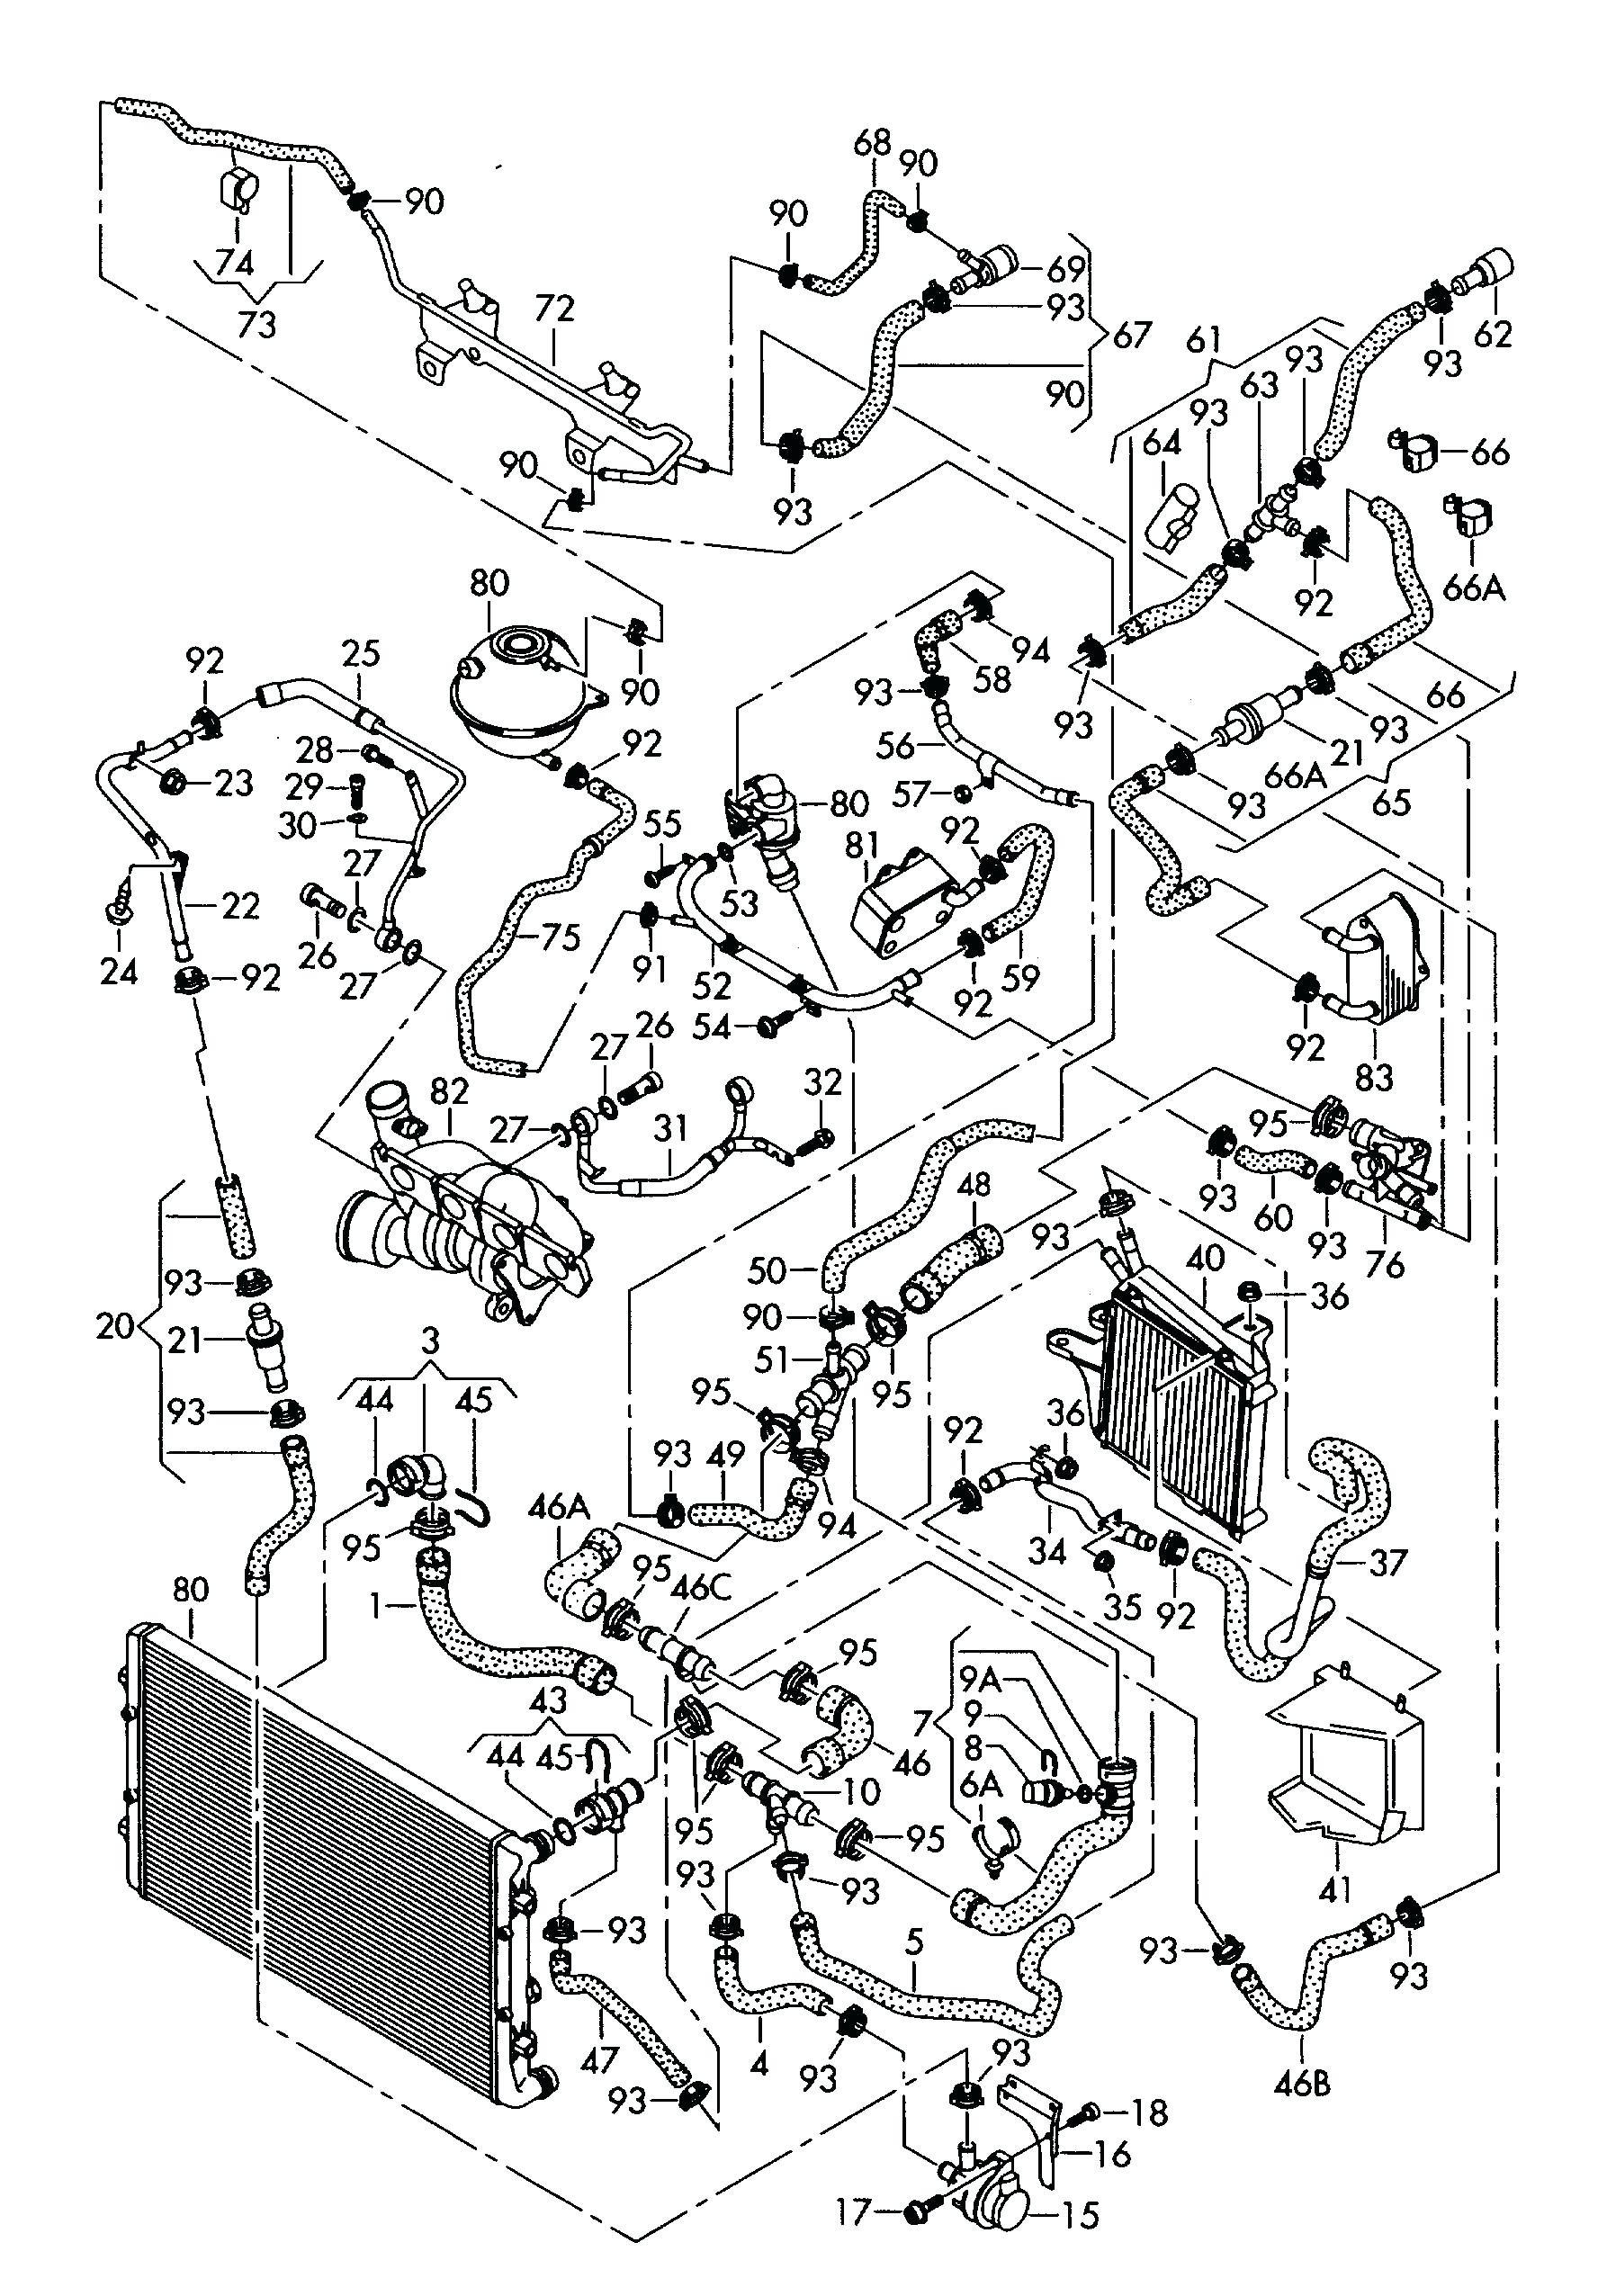 hight resolution of vw touareg engine diagram trailer wiring diagram new wiring diagram 4 wire trailer wiring diagram touareg